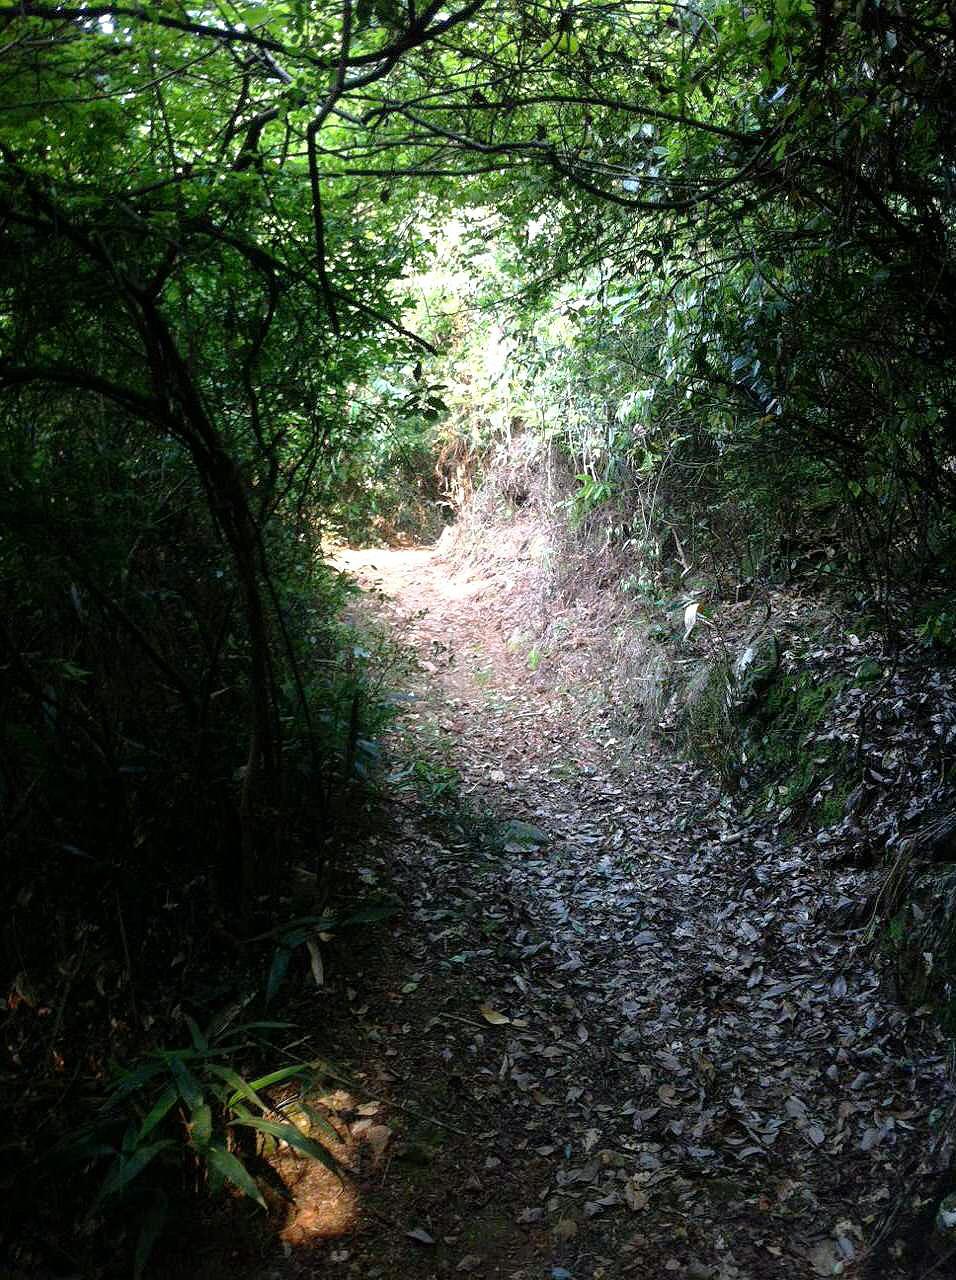 The Trail into Our Tea Mountain